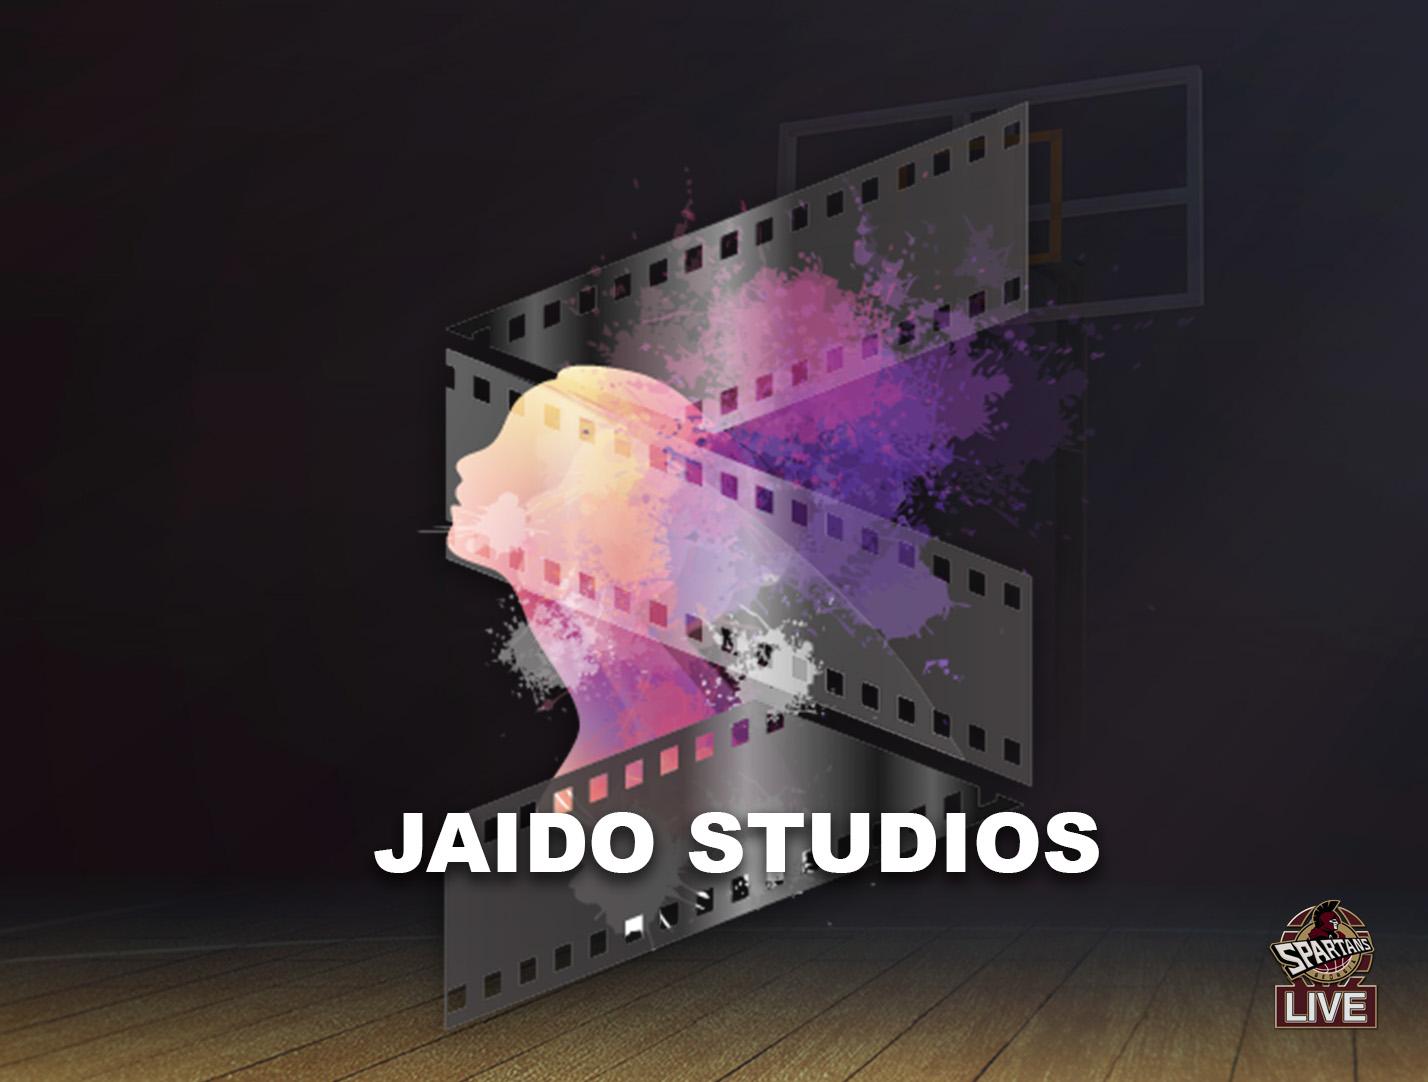 Jaido Studios Georgia Spartans Team Sponsor